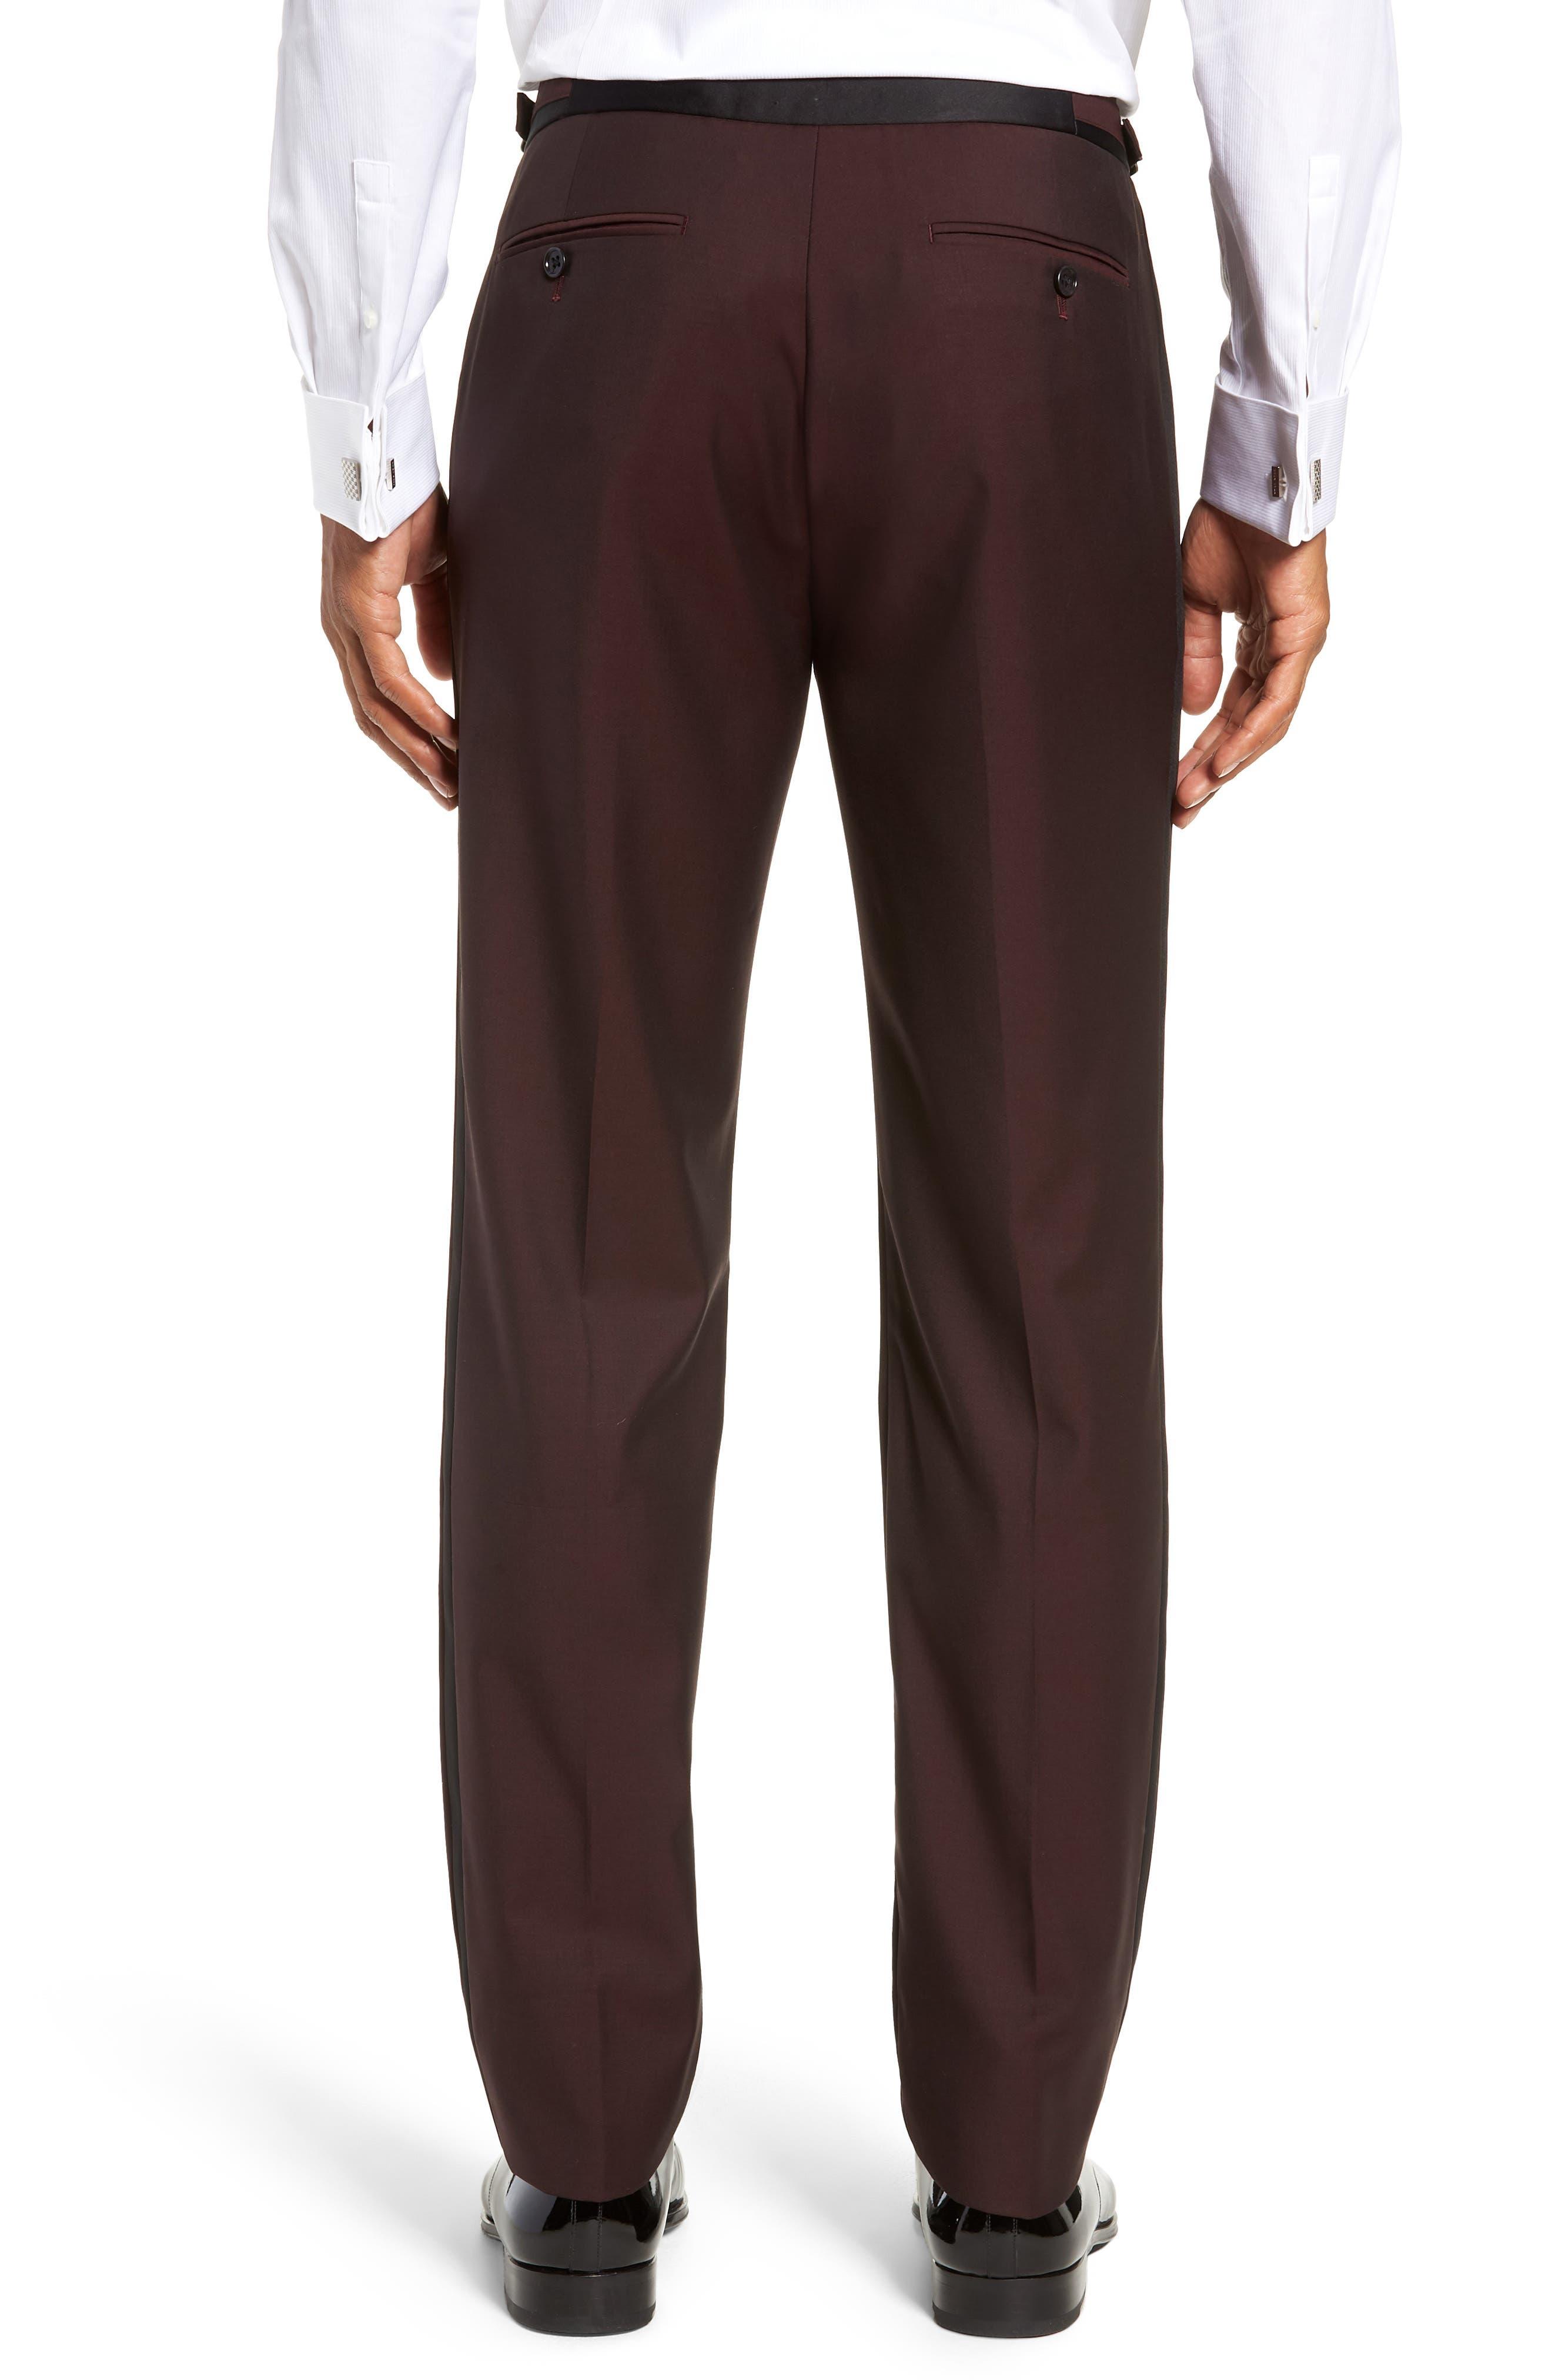 Capstone Slim Fit Tuxedo Trousers,                             Alternate thumbnail 2, color,                             MAROON